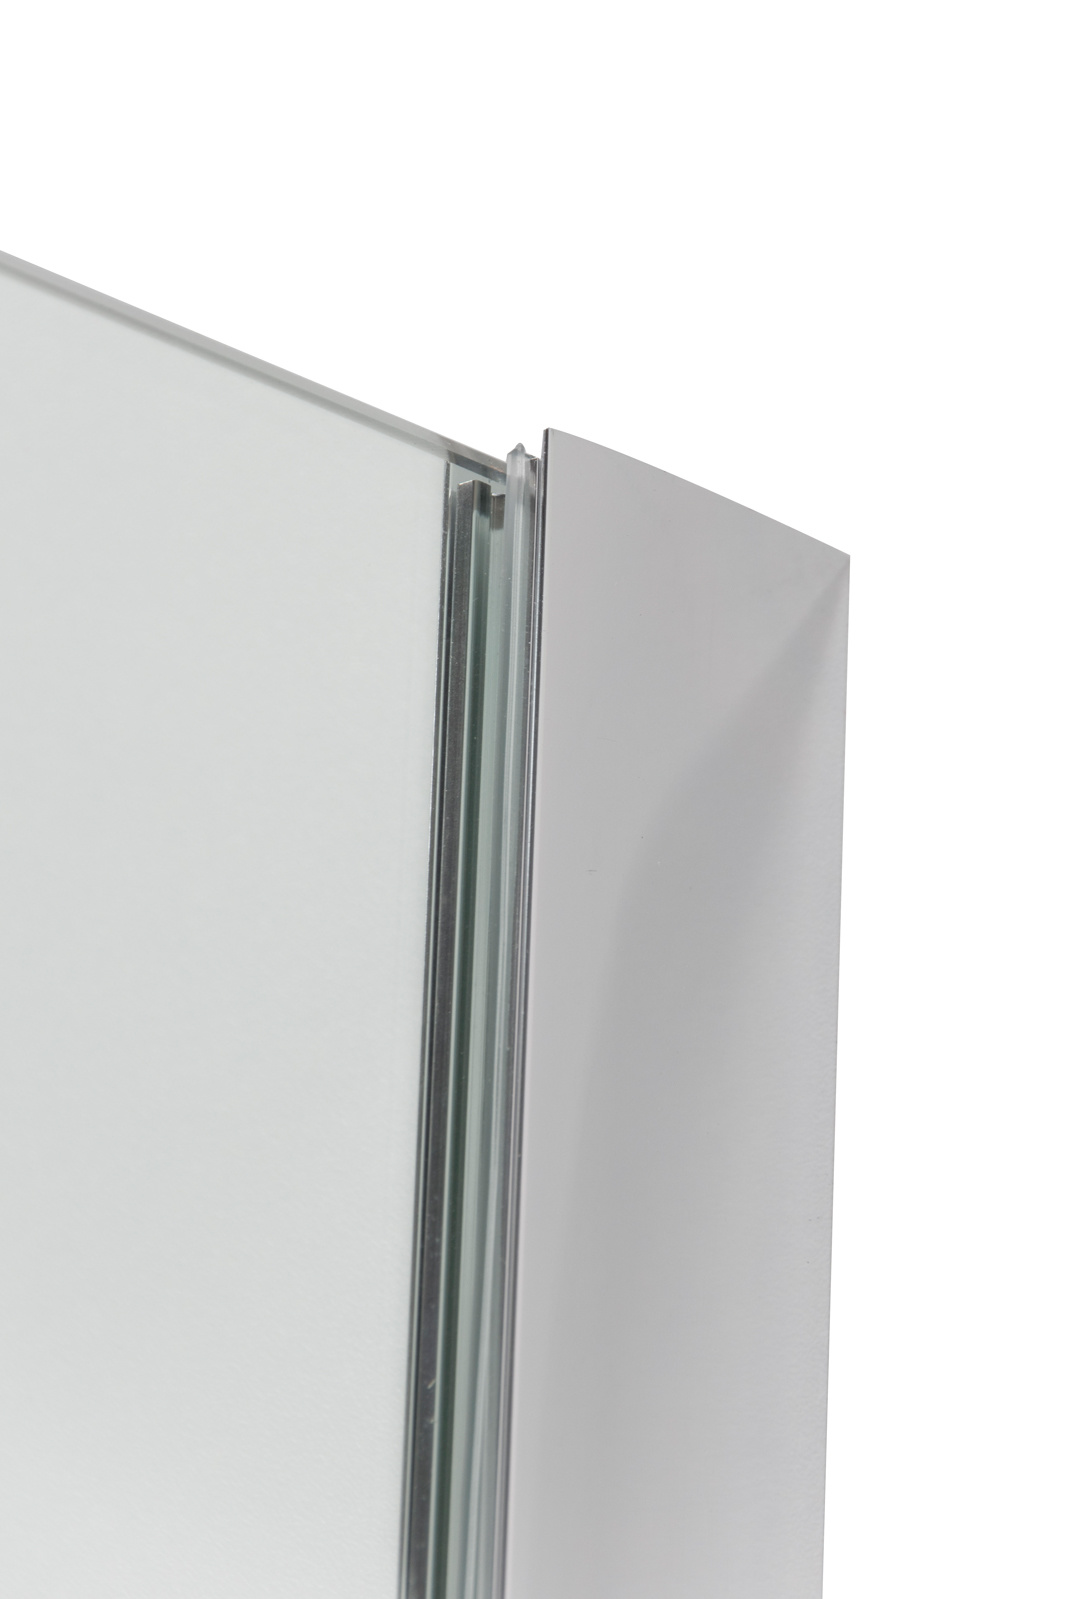 Linea Uno Inloopdouche Göteborg 10 x 200 cm